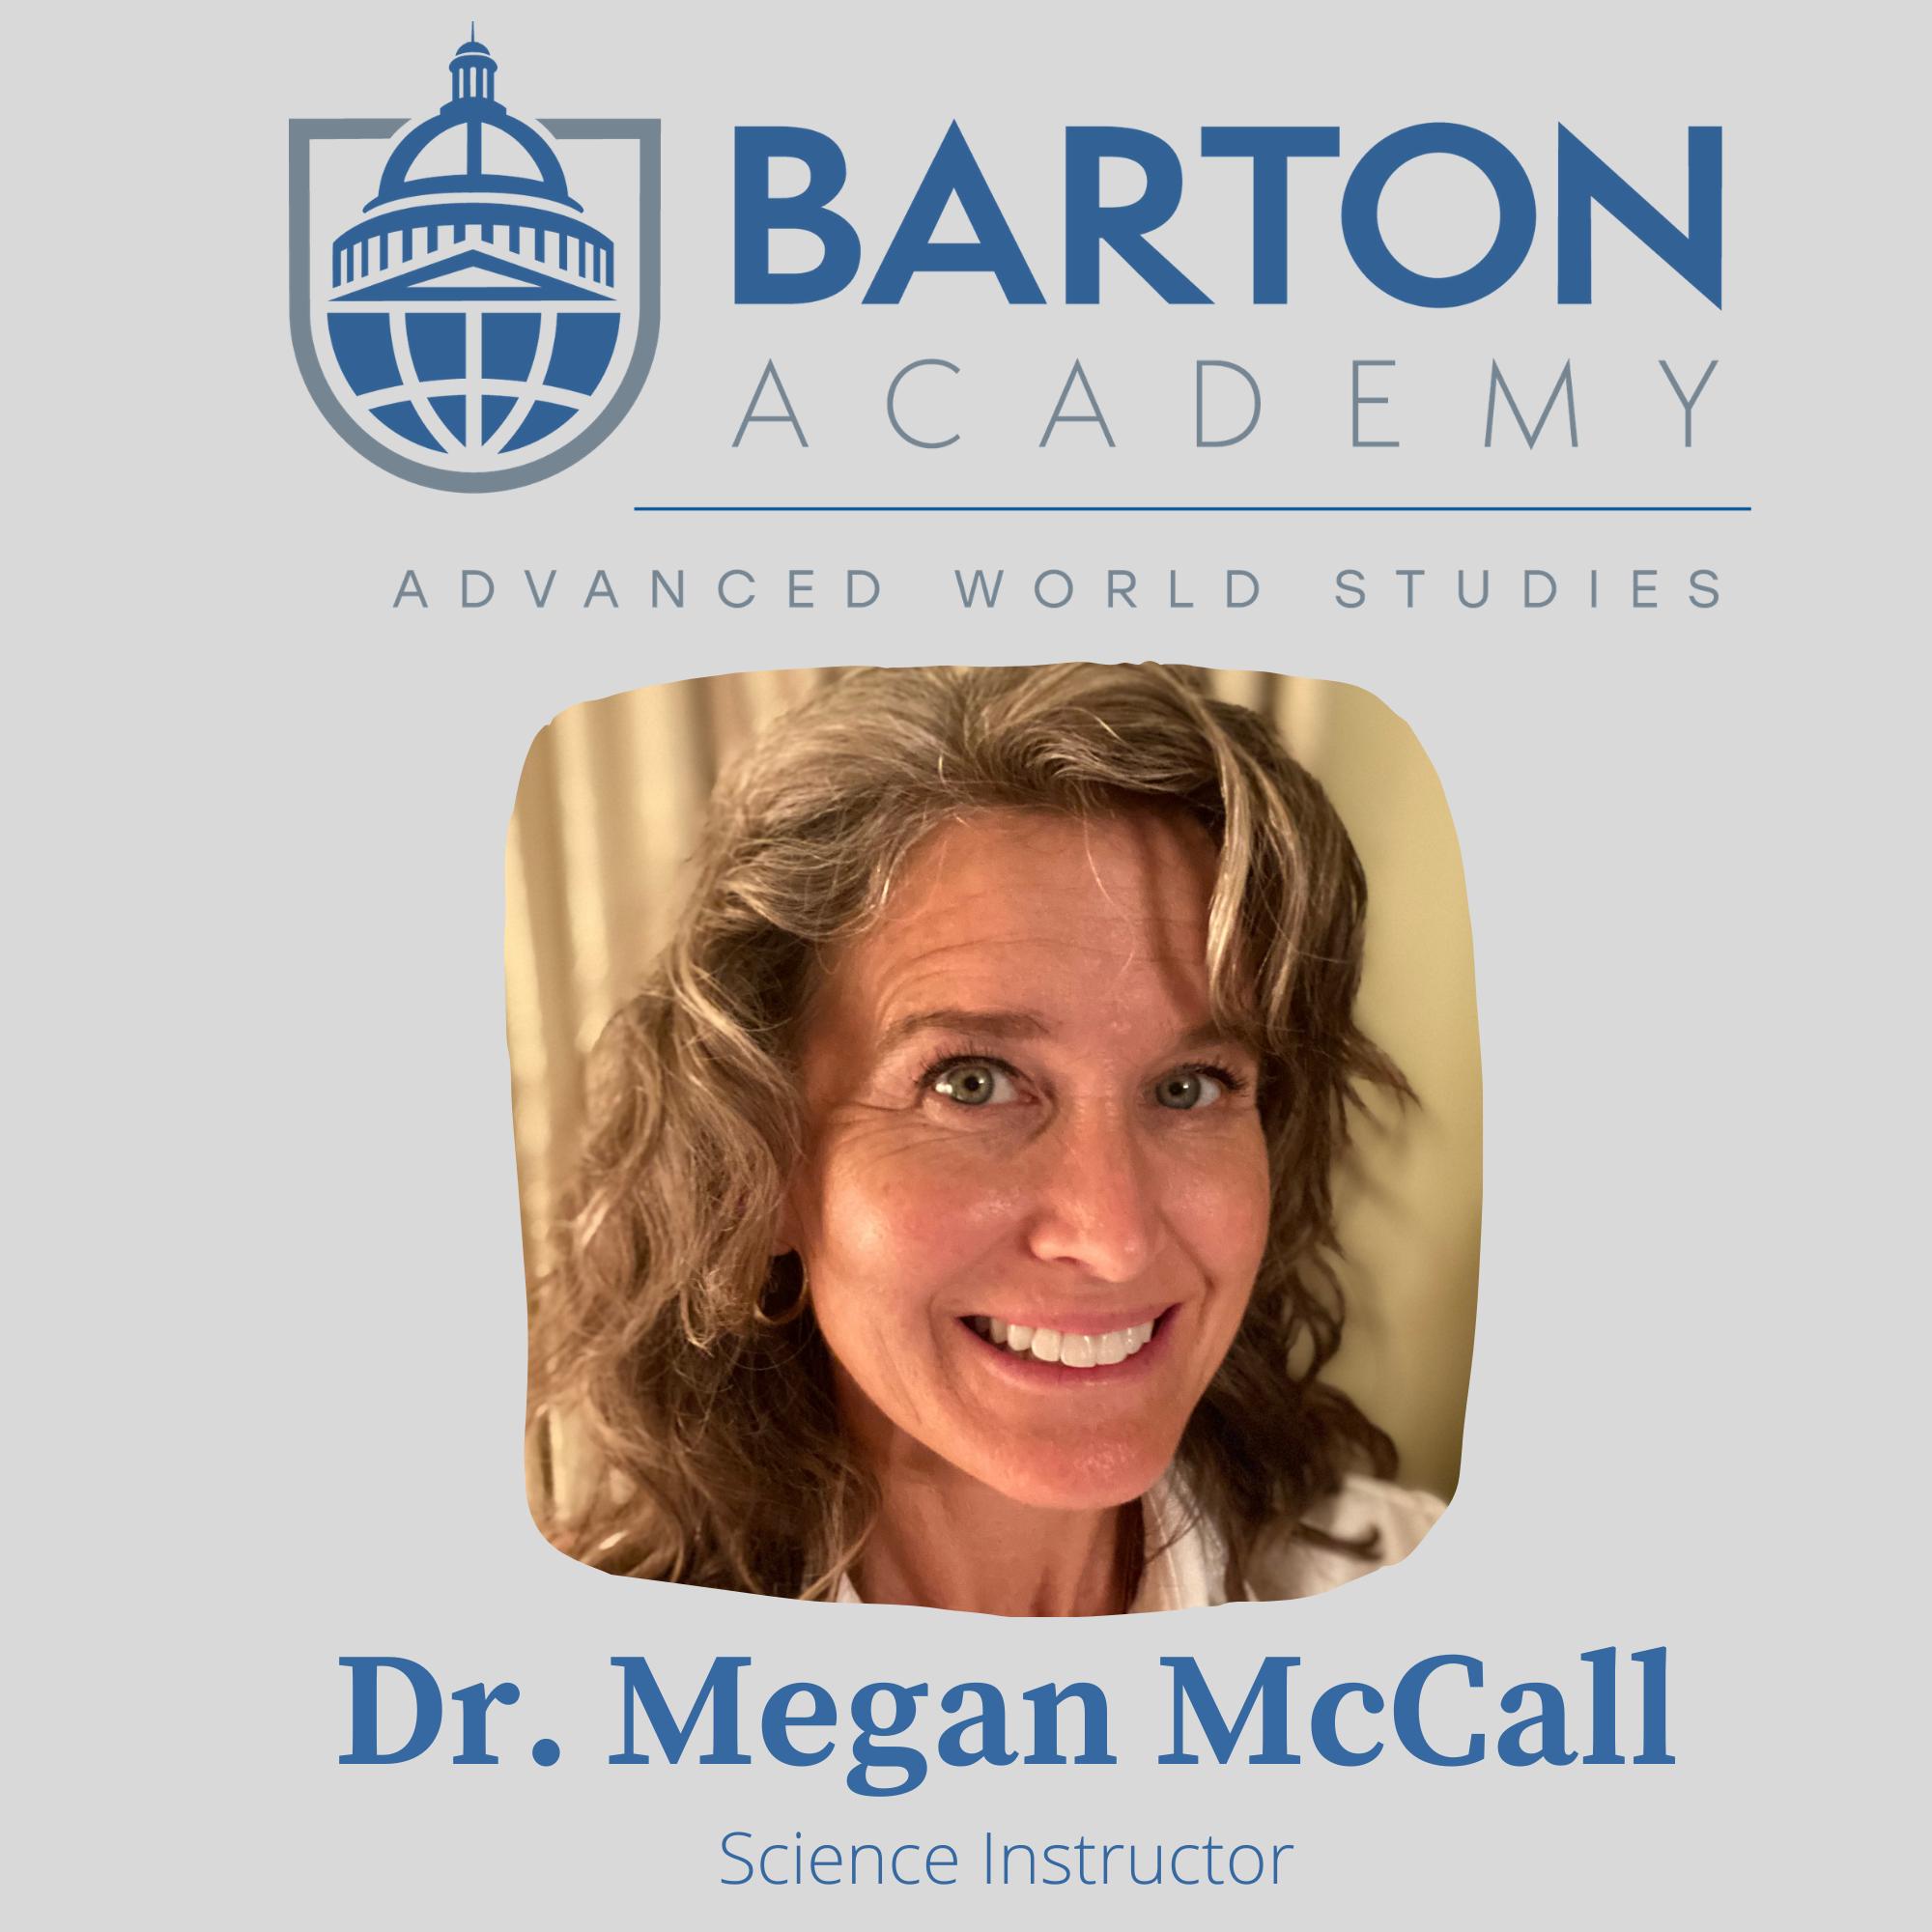 Dr. McCall